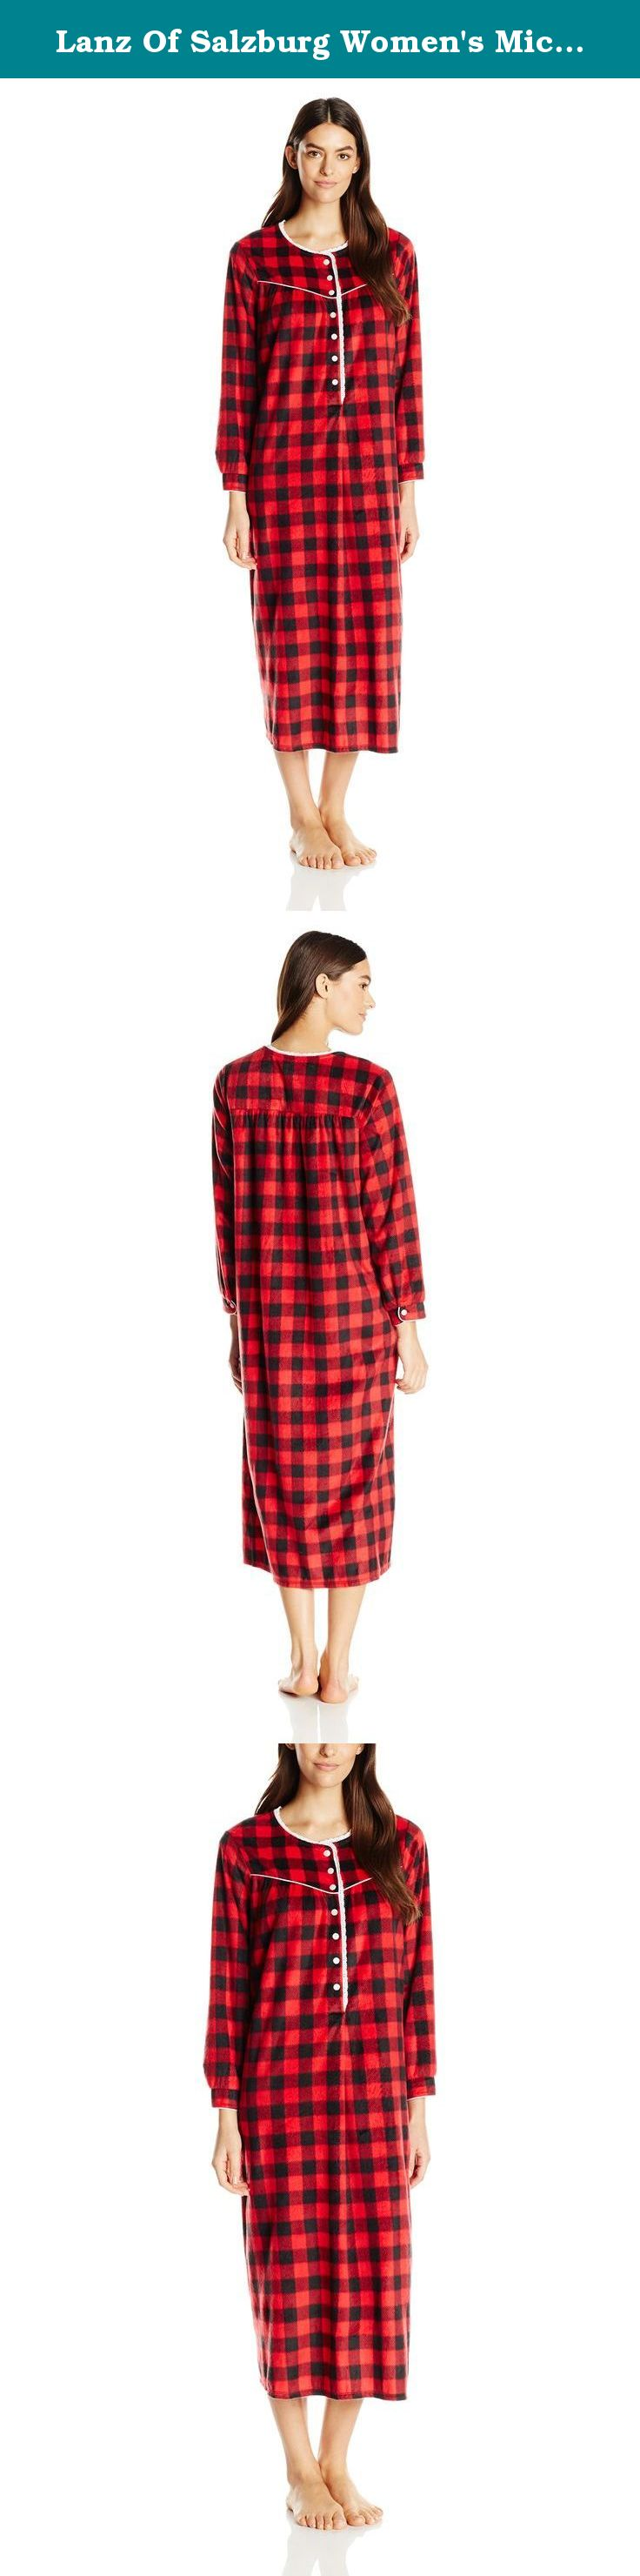 Red flannel nightgown  Lanz Of Salzburg Womenus Microfleece Long Nightgown RedPlaid